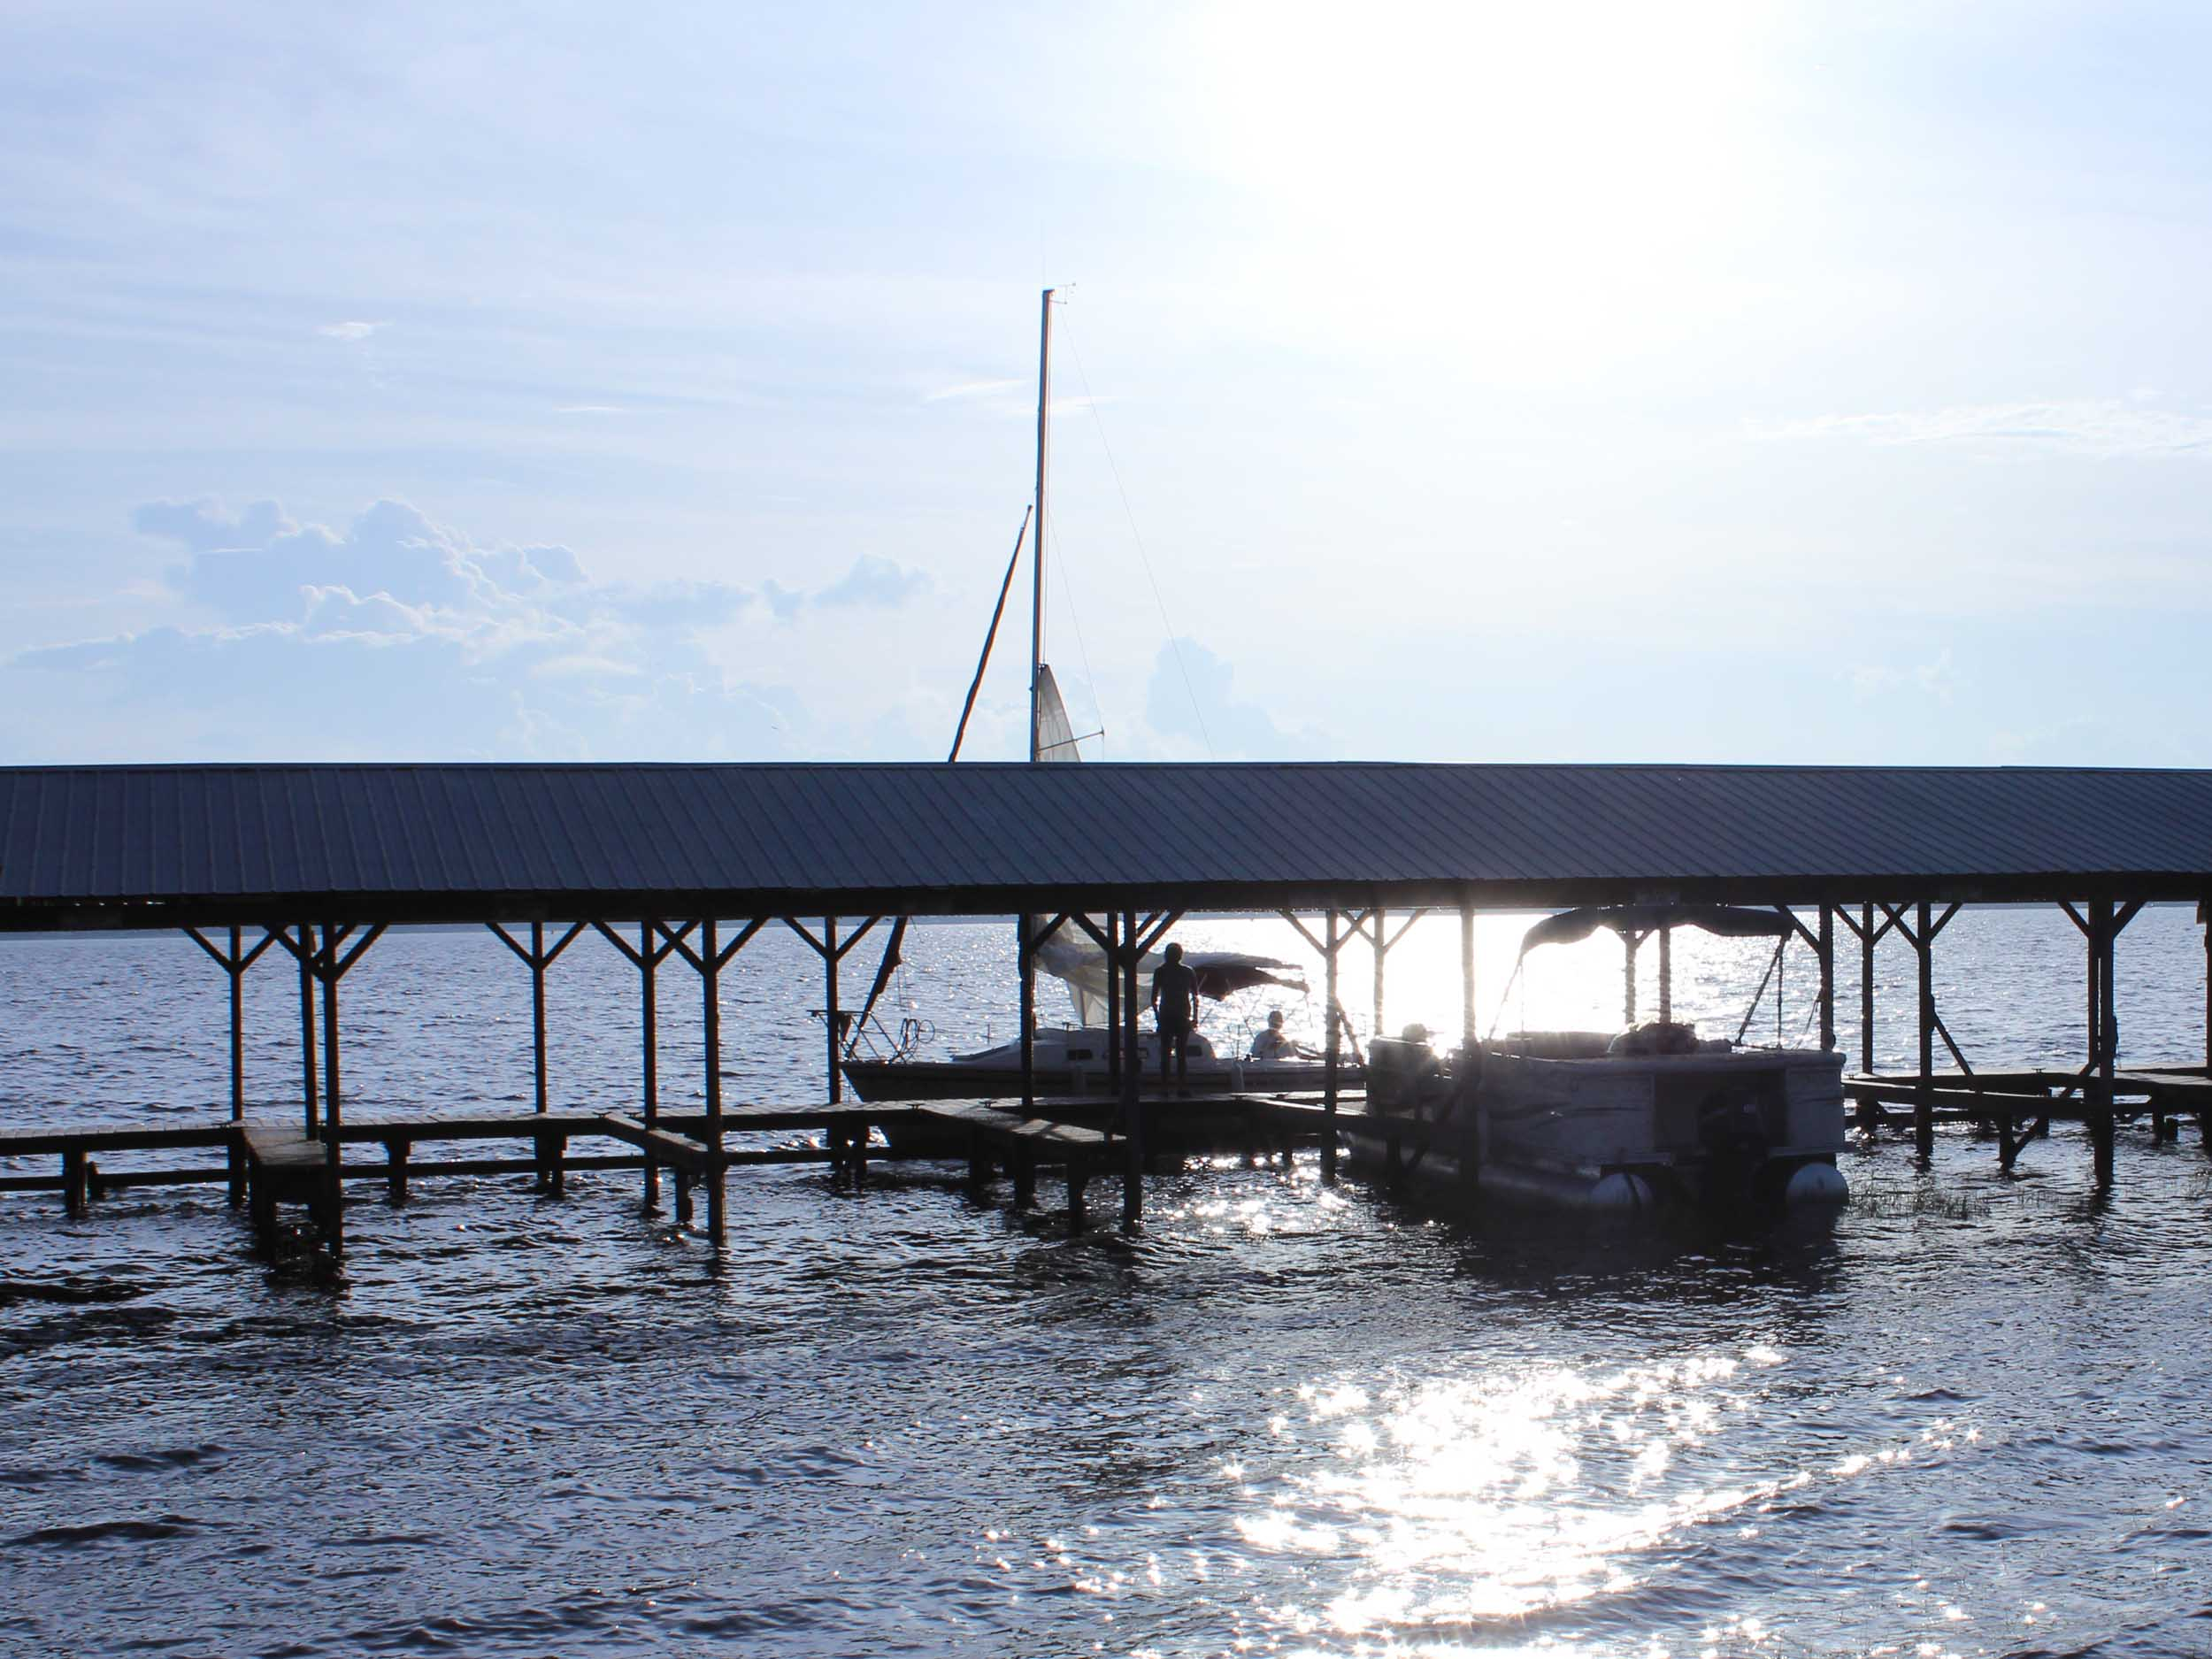 Minneola Tiki Bar Water View